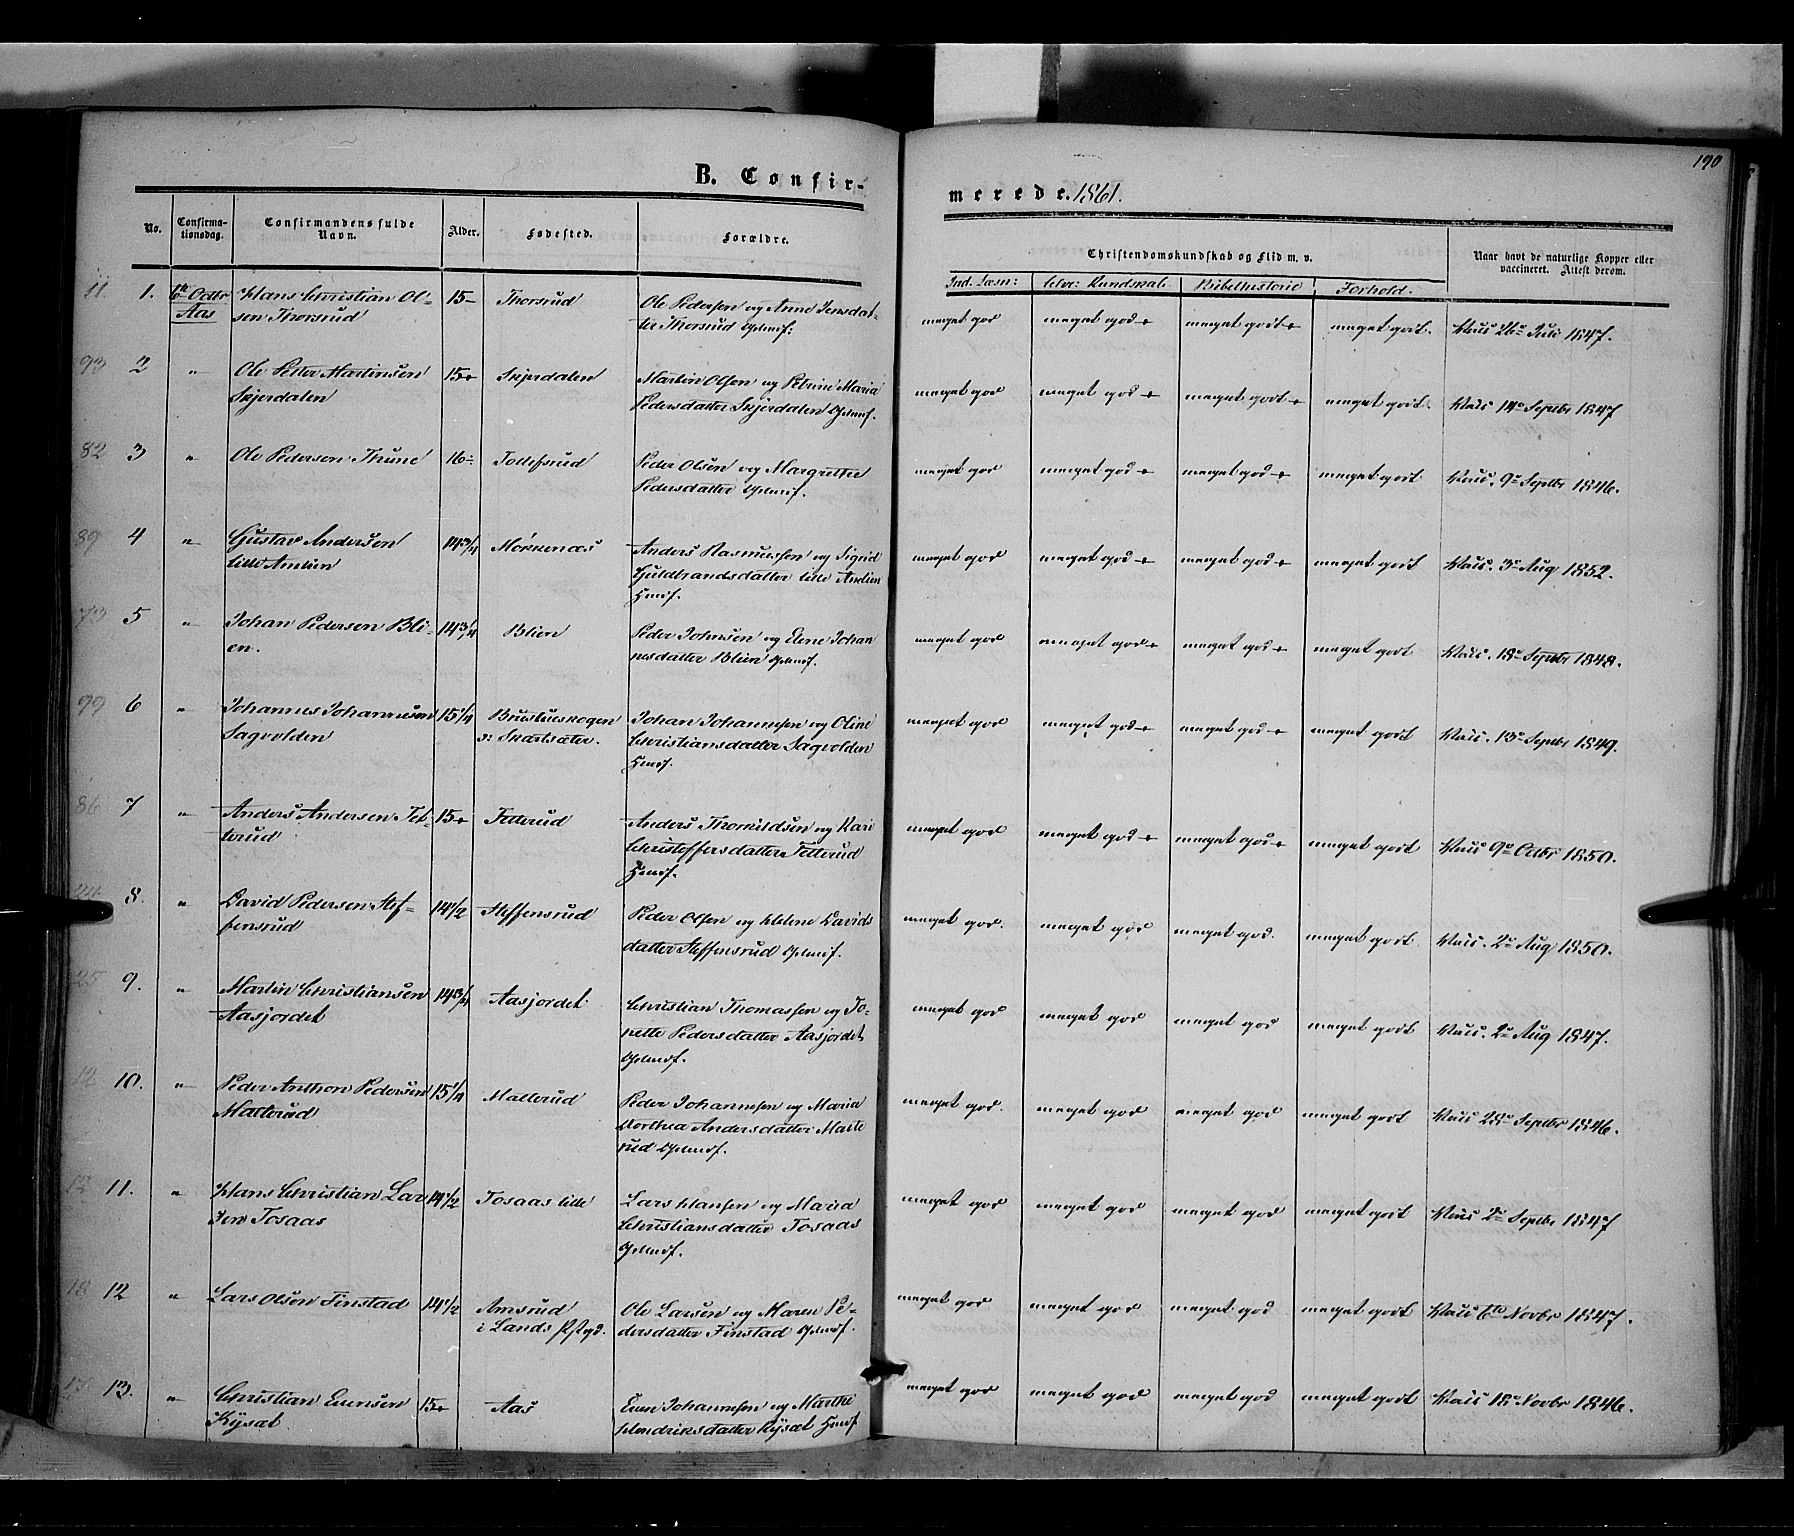 SAH, Vestre Toten prestekontor, H/Ha/Haa/L0006: Ministerialbok nr. 6, 1856-1861, s. 190